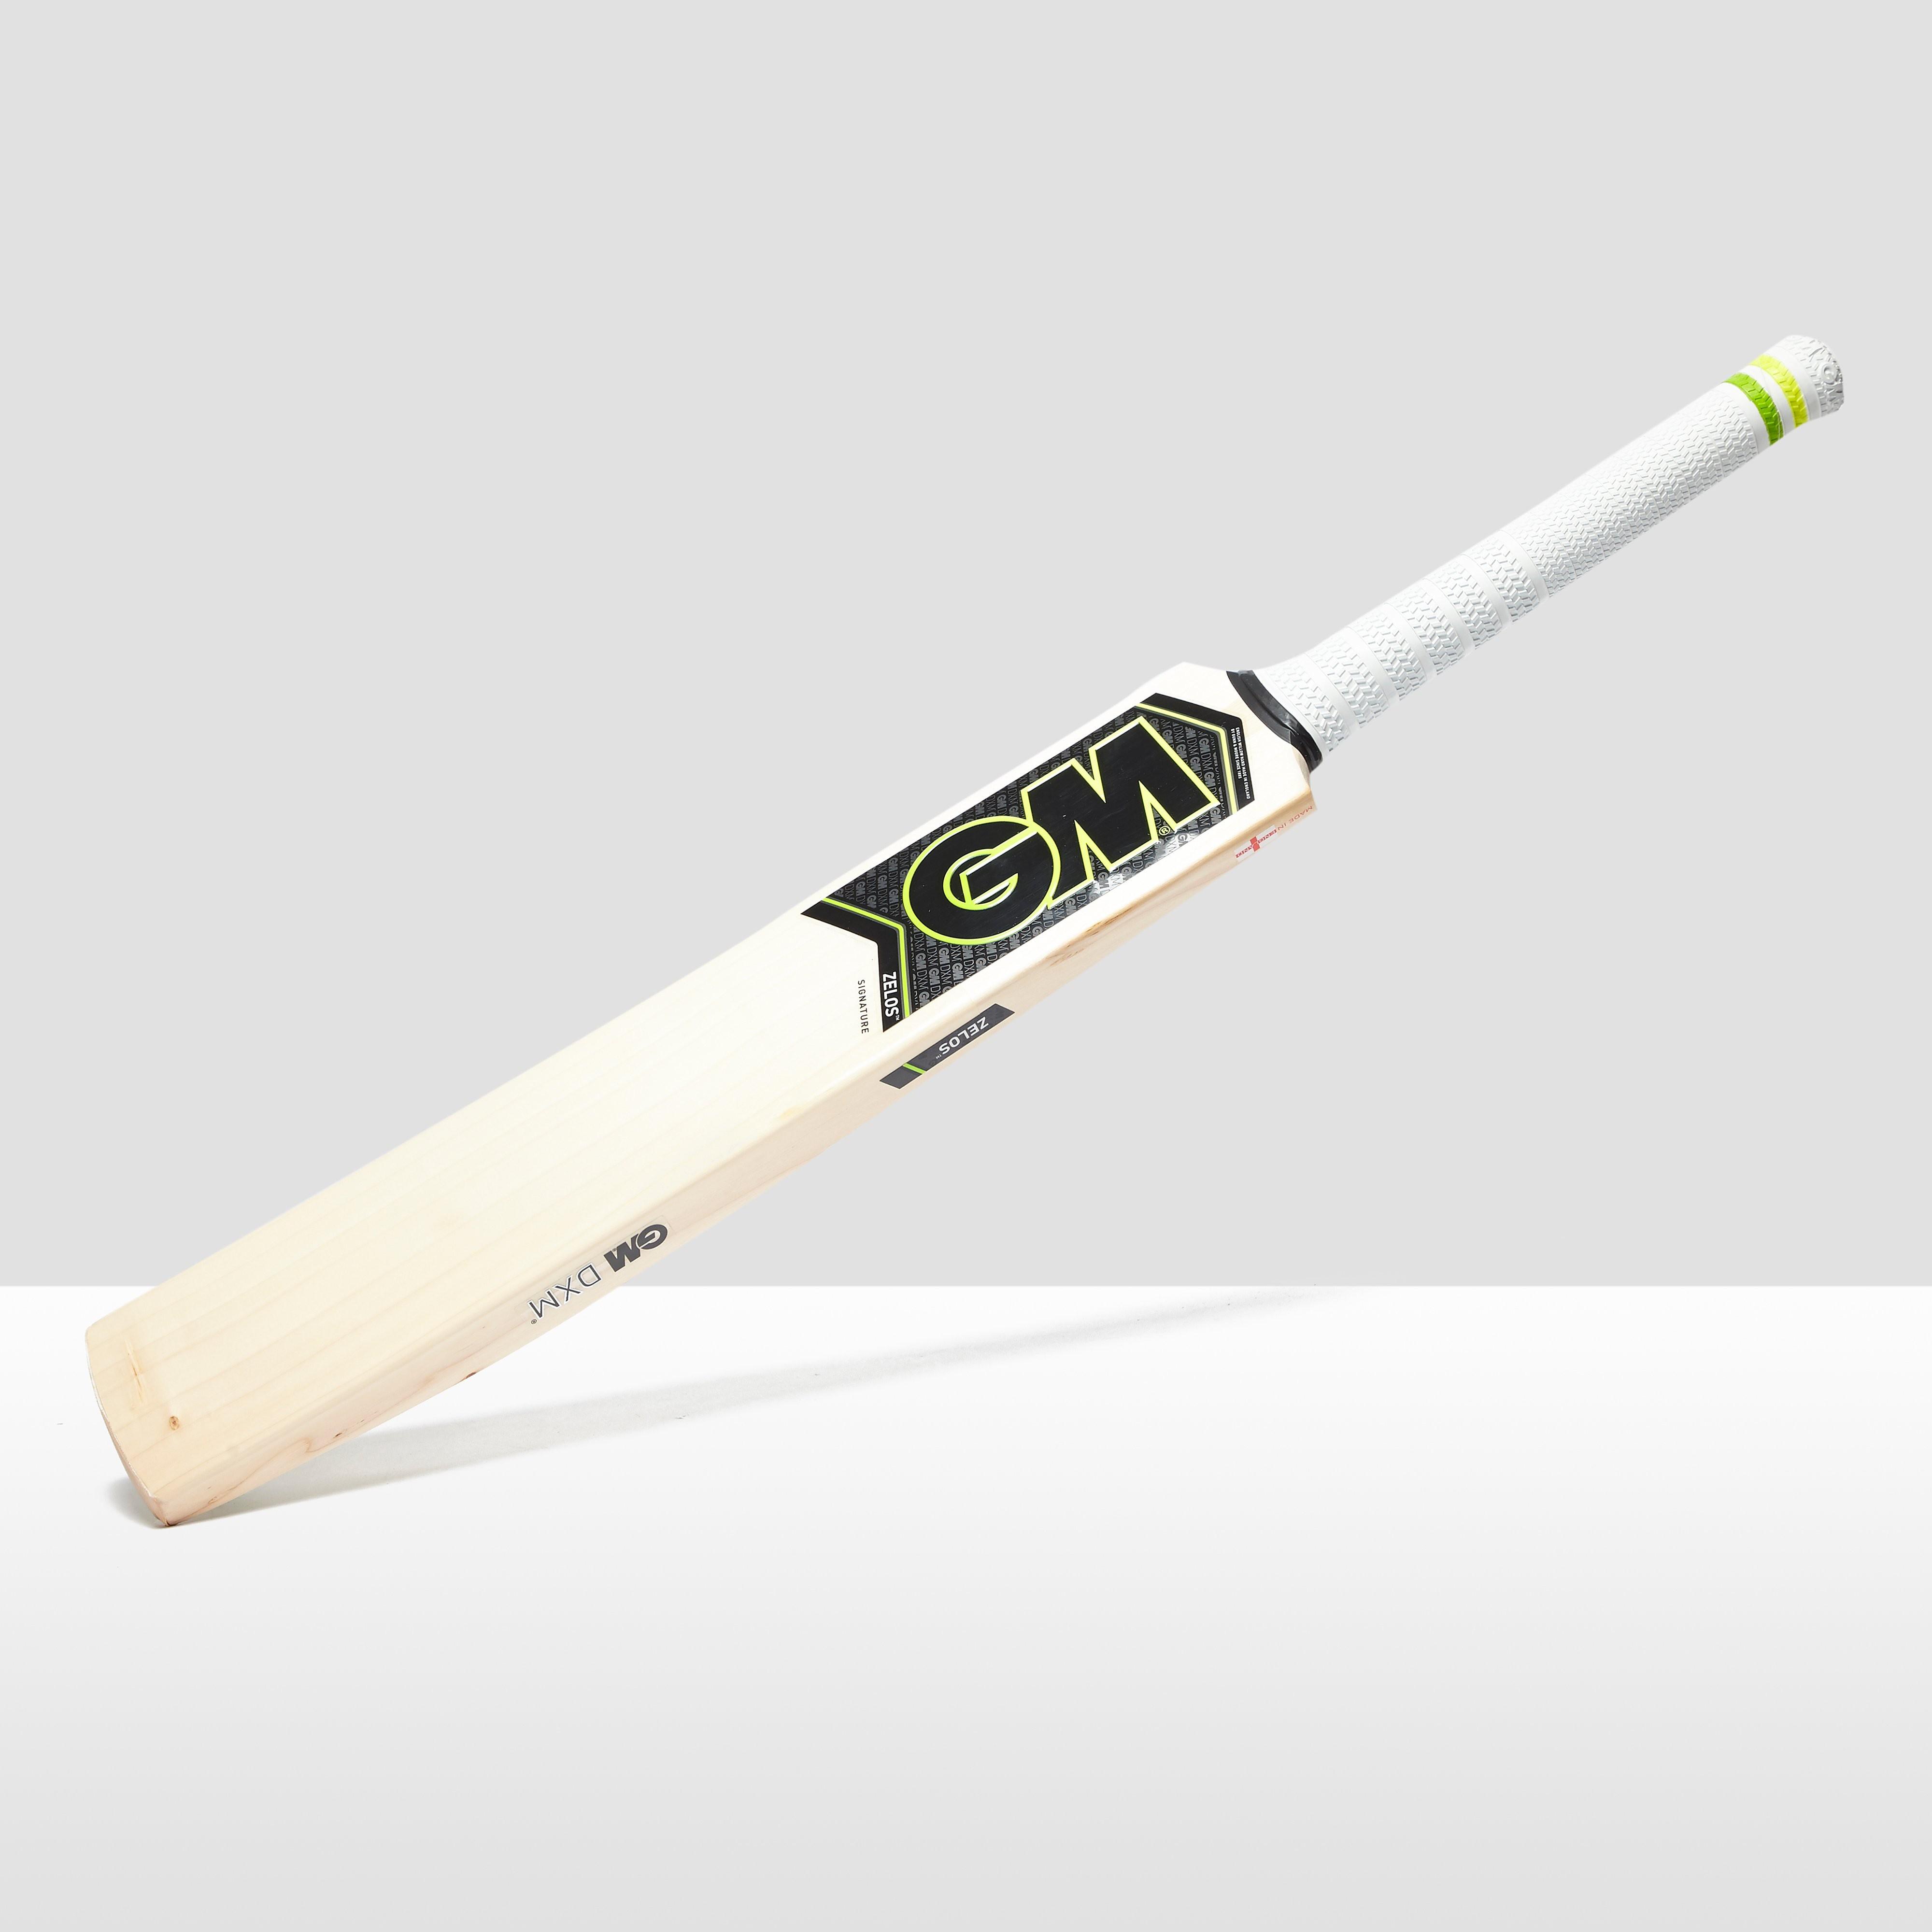 Gunn u0026 Moore Gunn & Moore  Zelos L555 Signature Cricket Bat - Brown/Yellow, Brown/Yellow